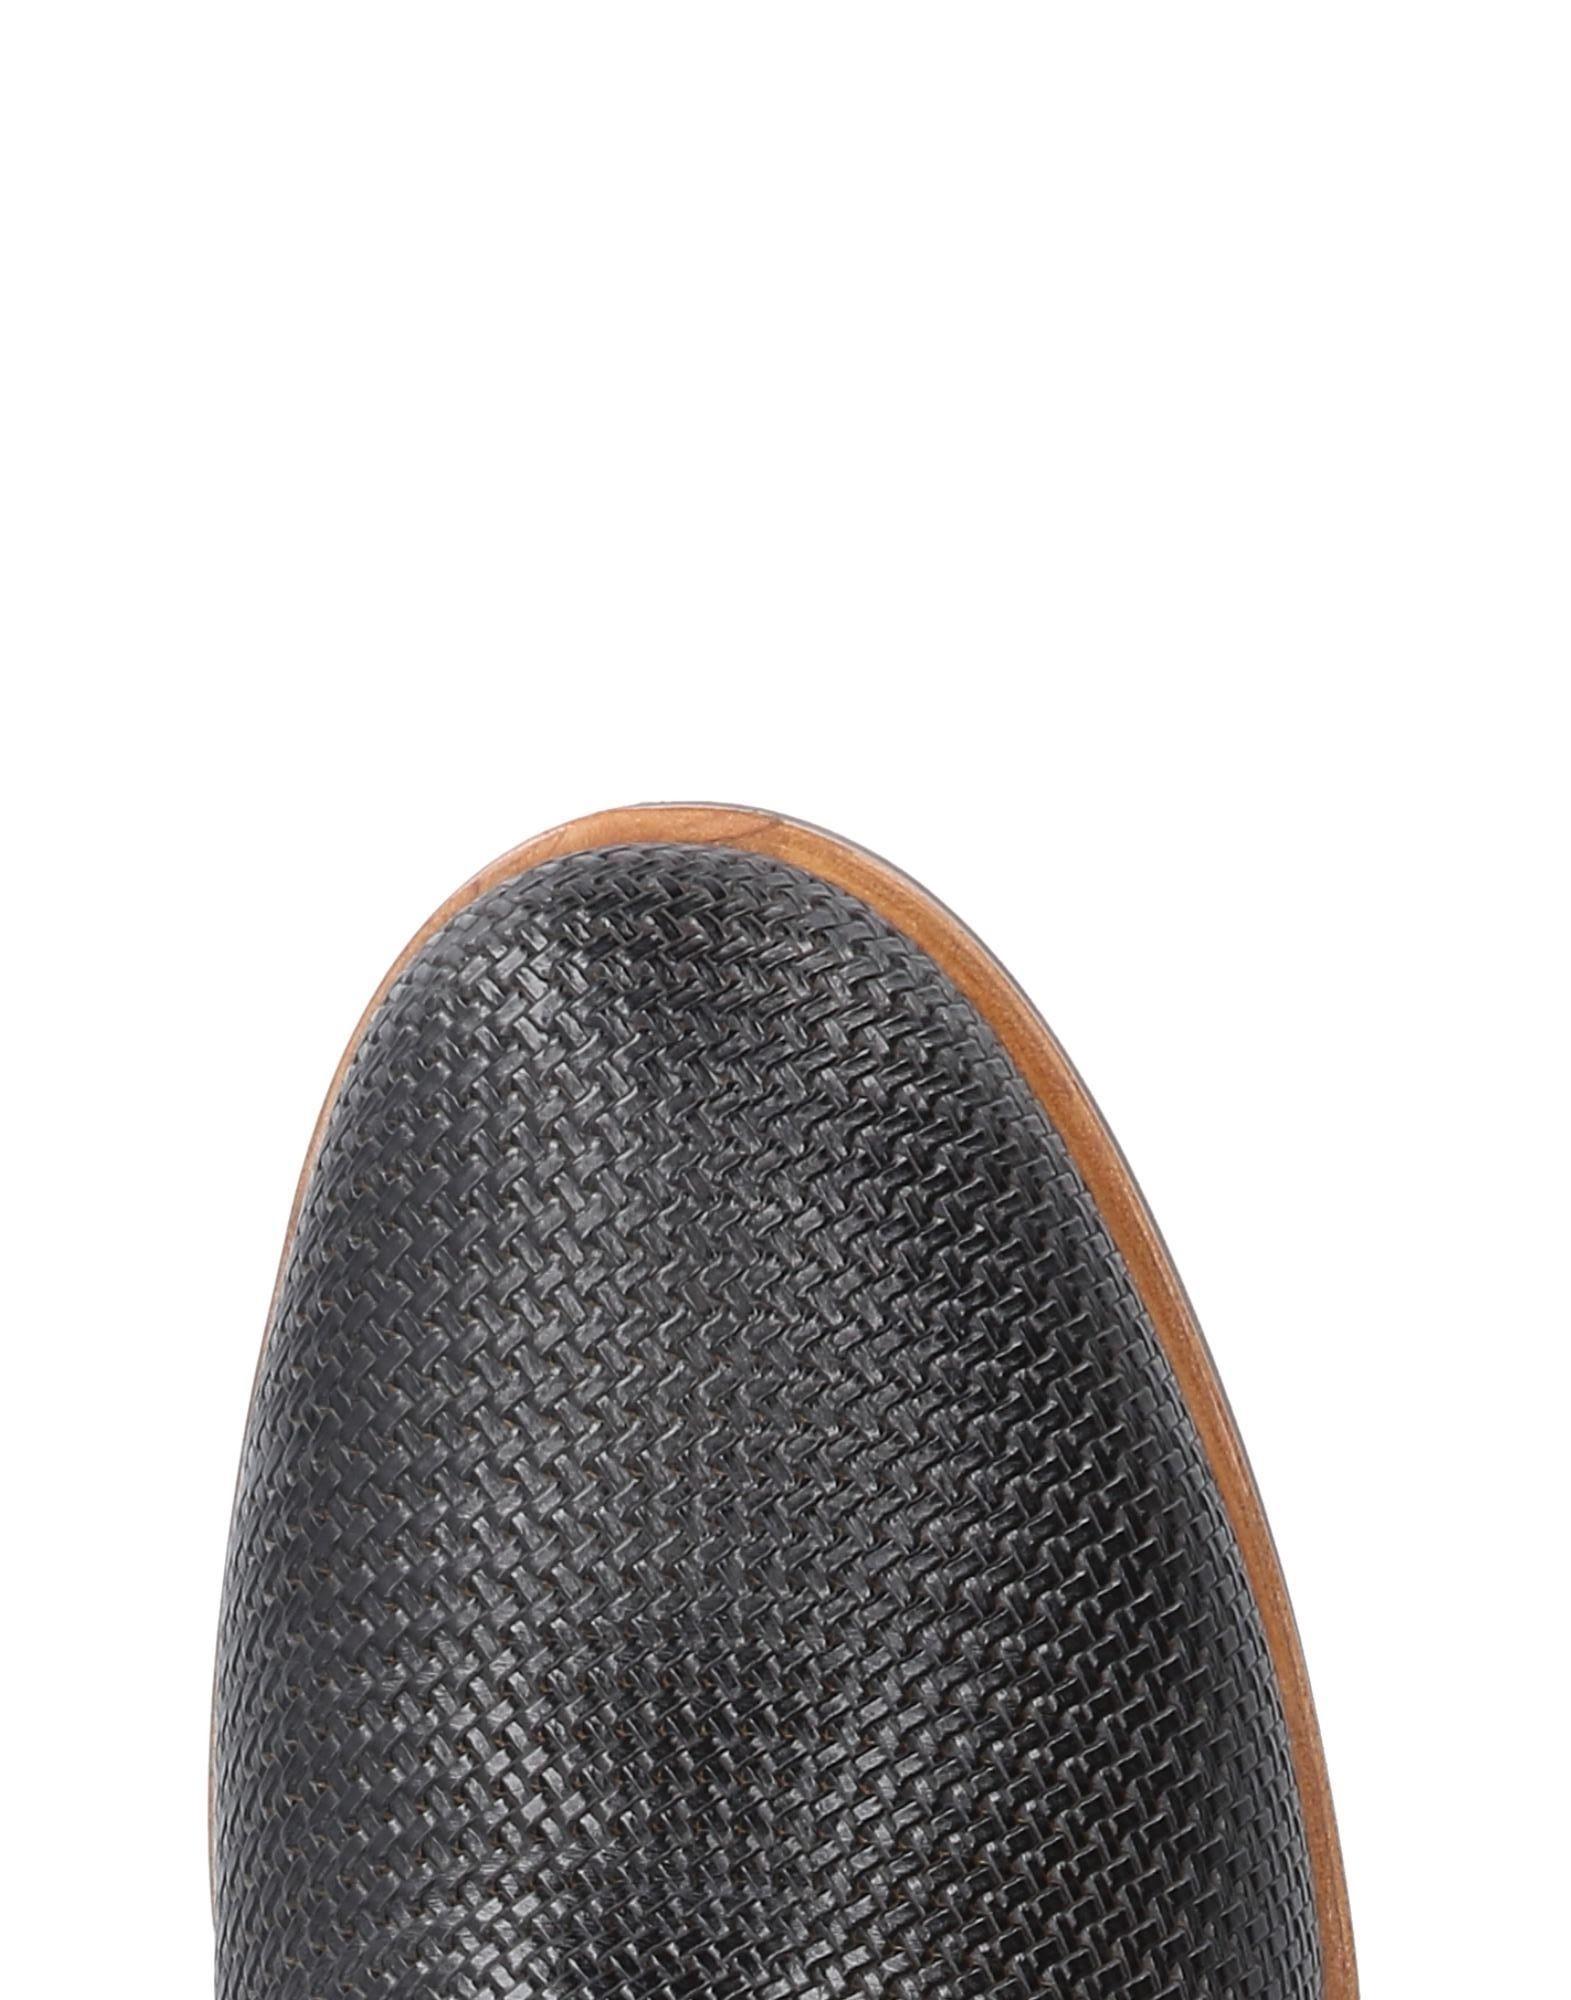 Fratelli Rossetti Mokassins Herren beliebte  11440885EM Gute Qualität beliebte Herren Schuhe 6b6f89